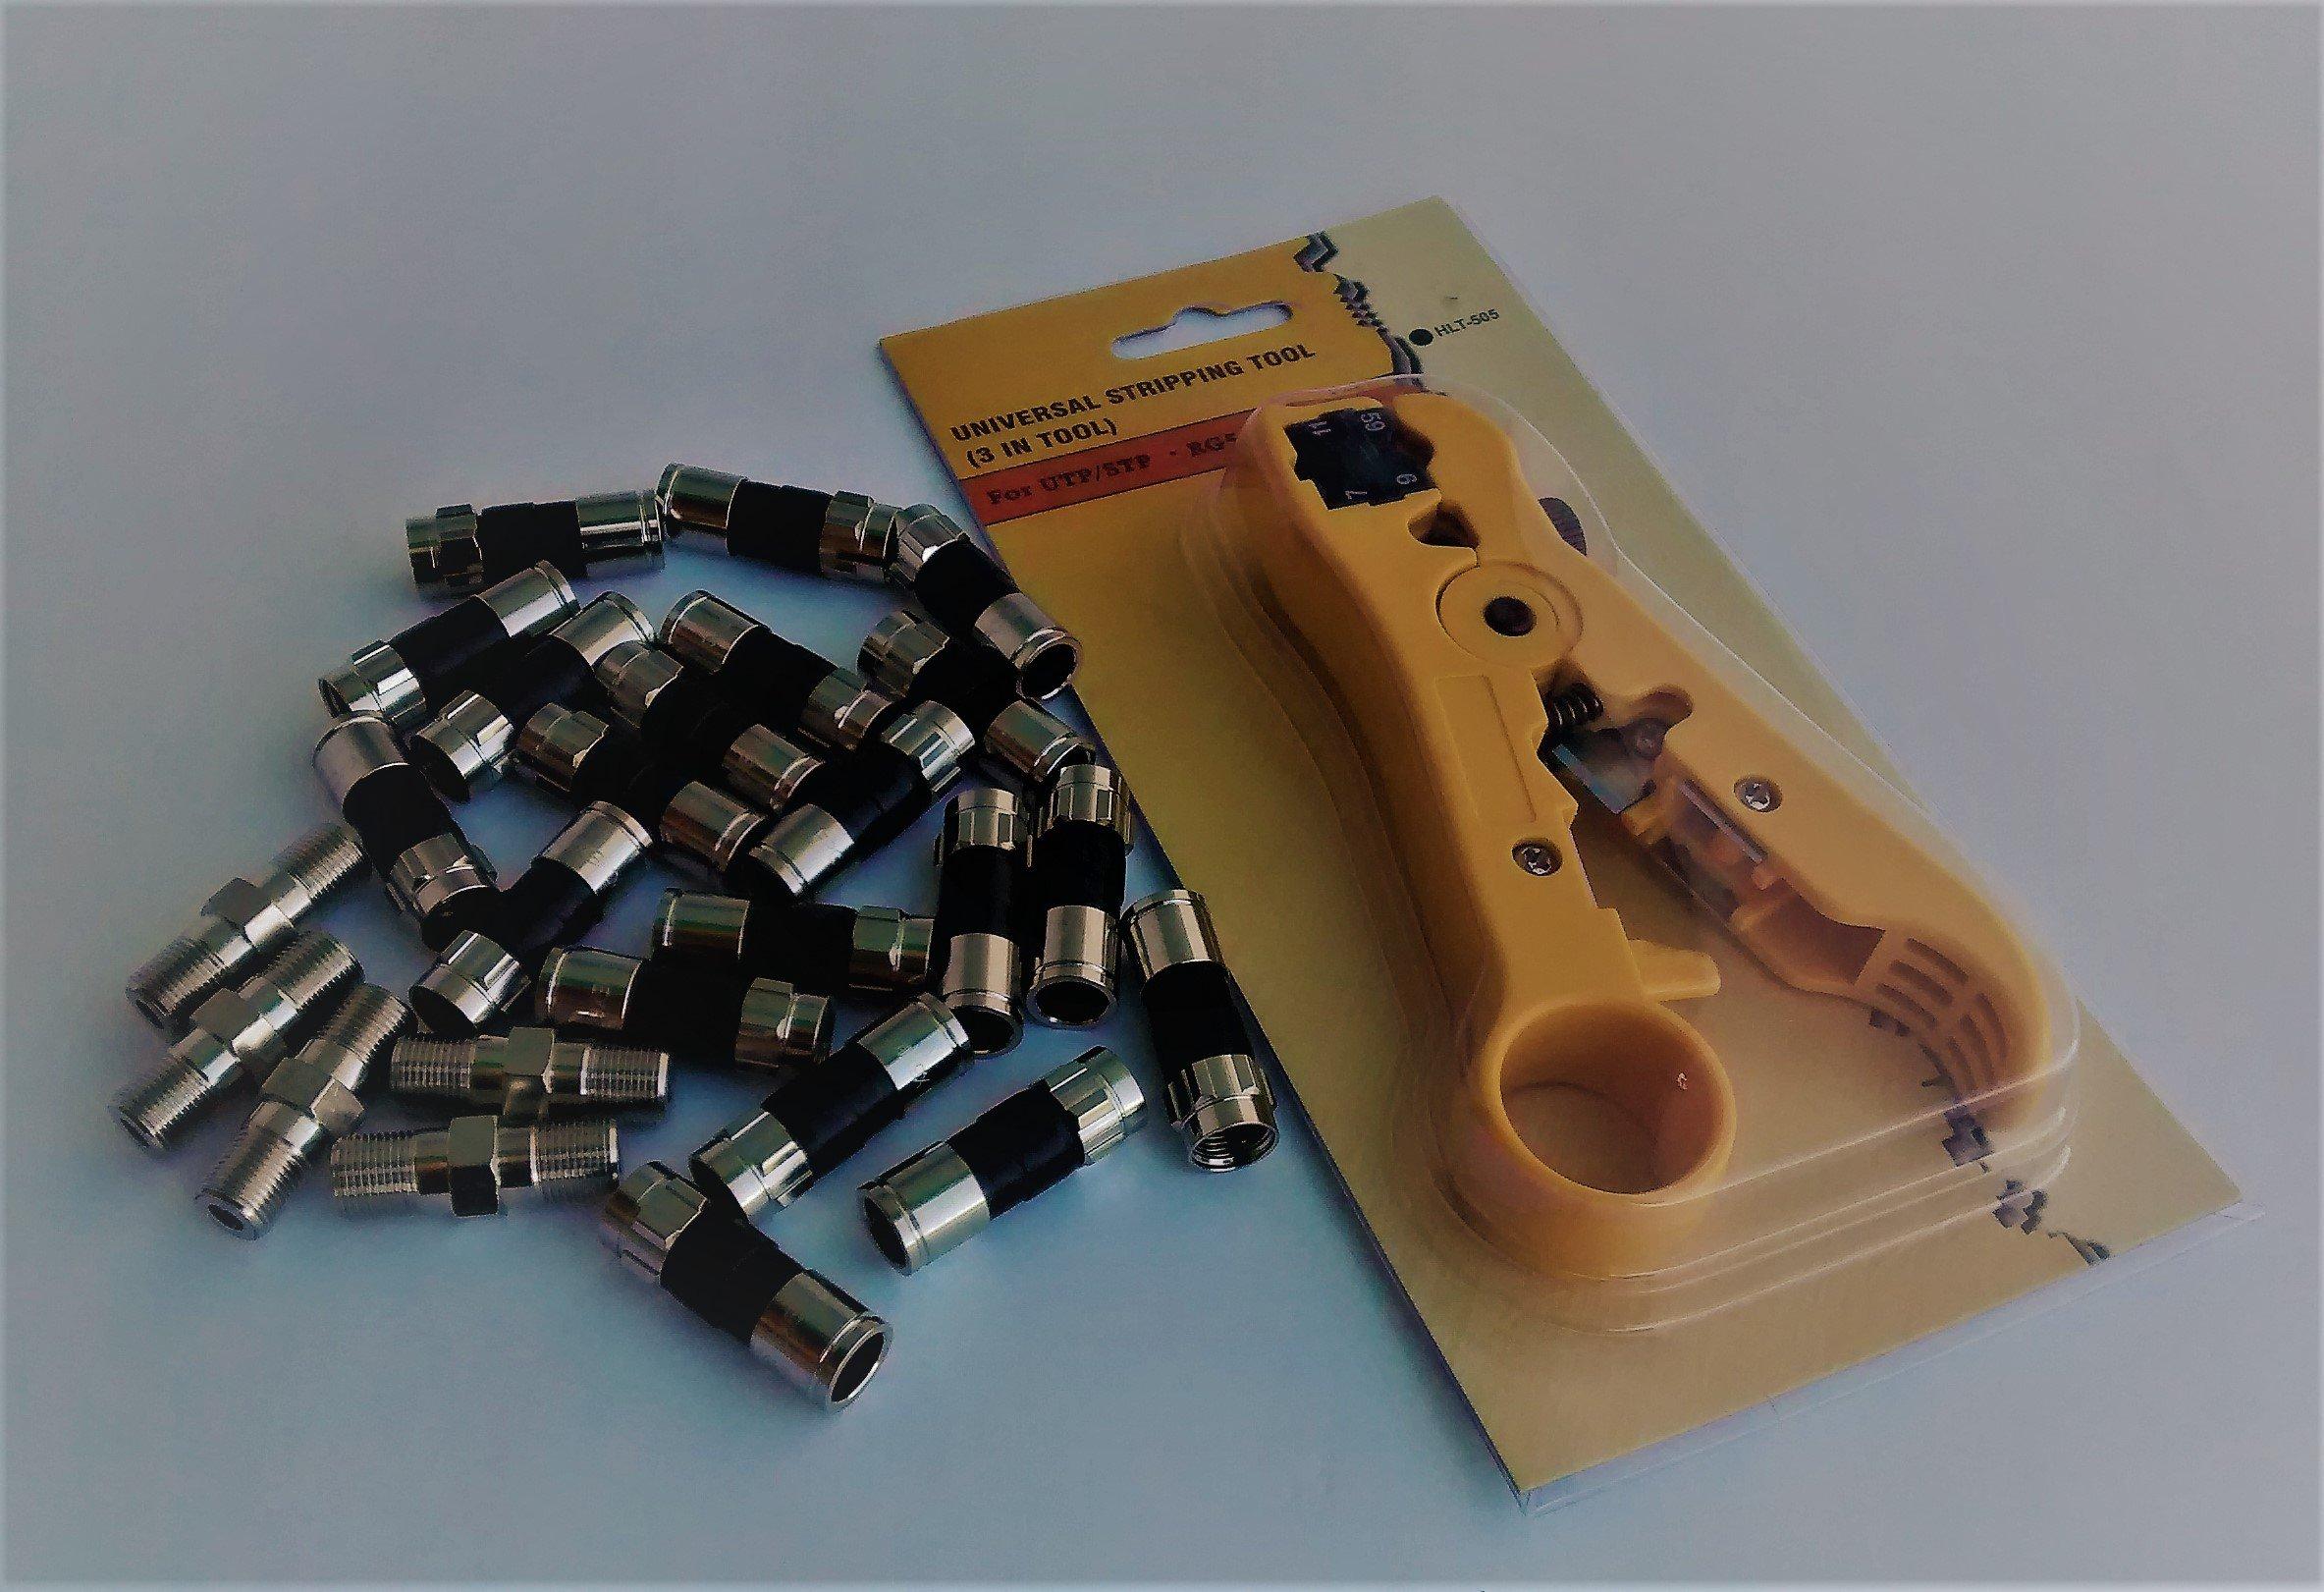 Coax Compression Connector Starter Kit - RG6 PPC EX6 XL PLUS (Belden/PPC) Quad Connectors, Universal Stripper/cutter Tool and PPC High Freq Barrel Connectors - Rg6/RG59 Series